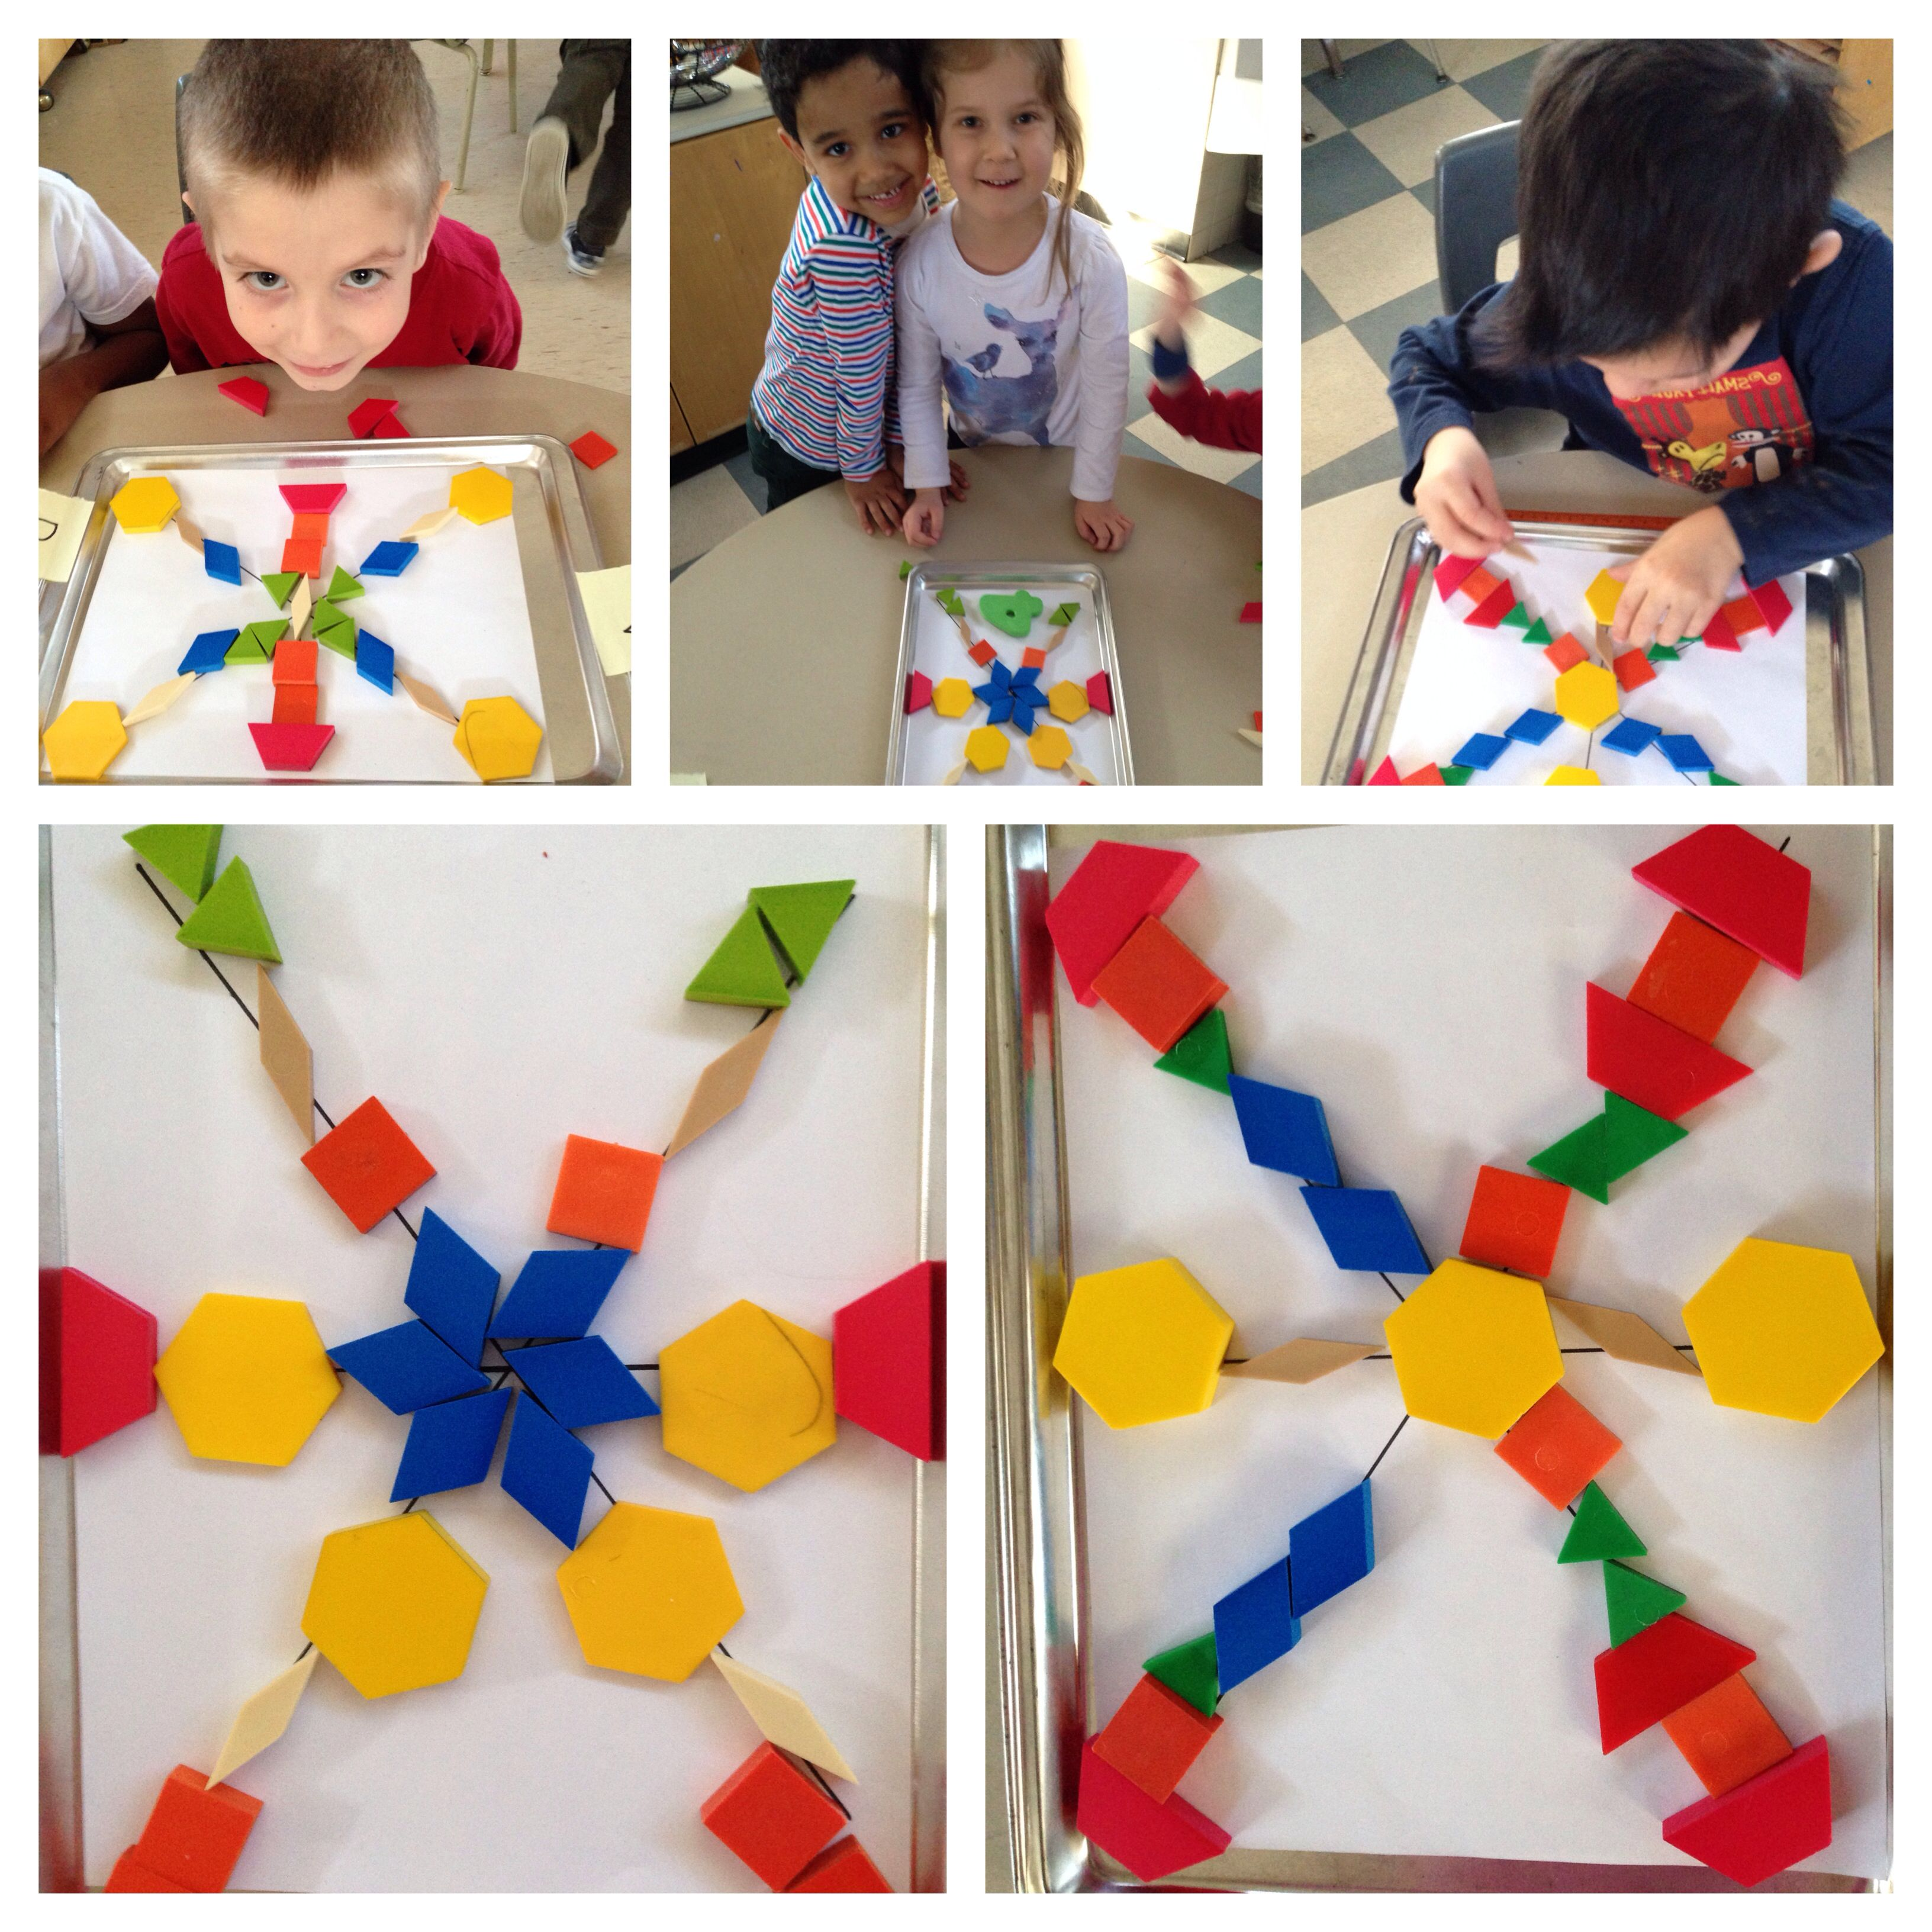 Symmetry Snowflakes Pattern Blocks